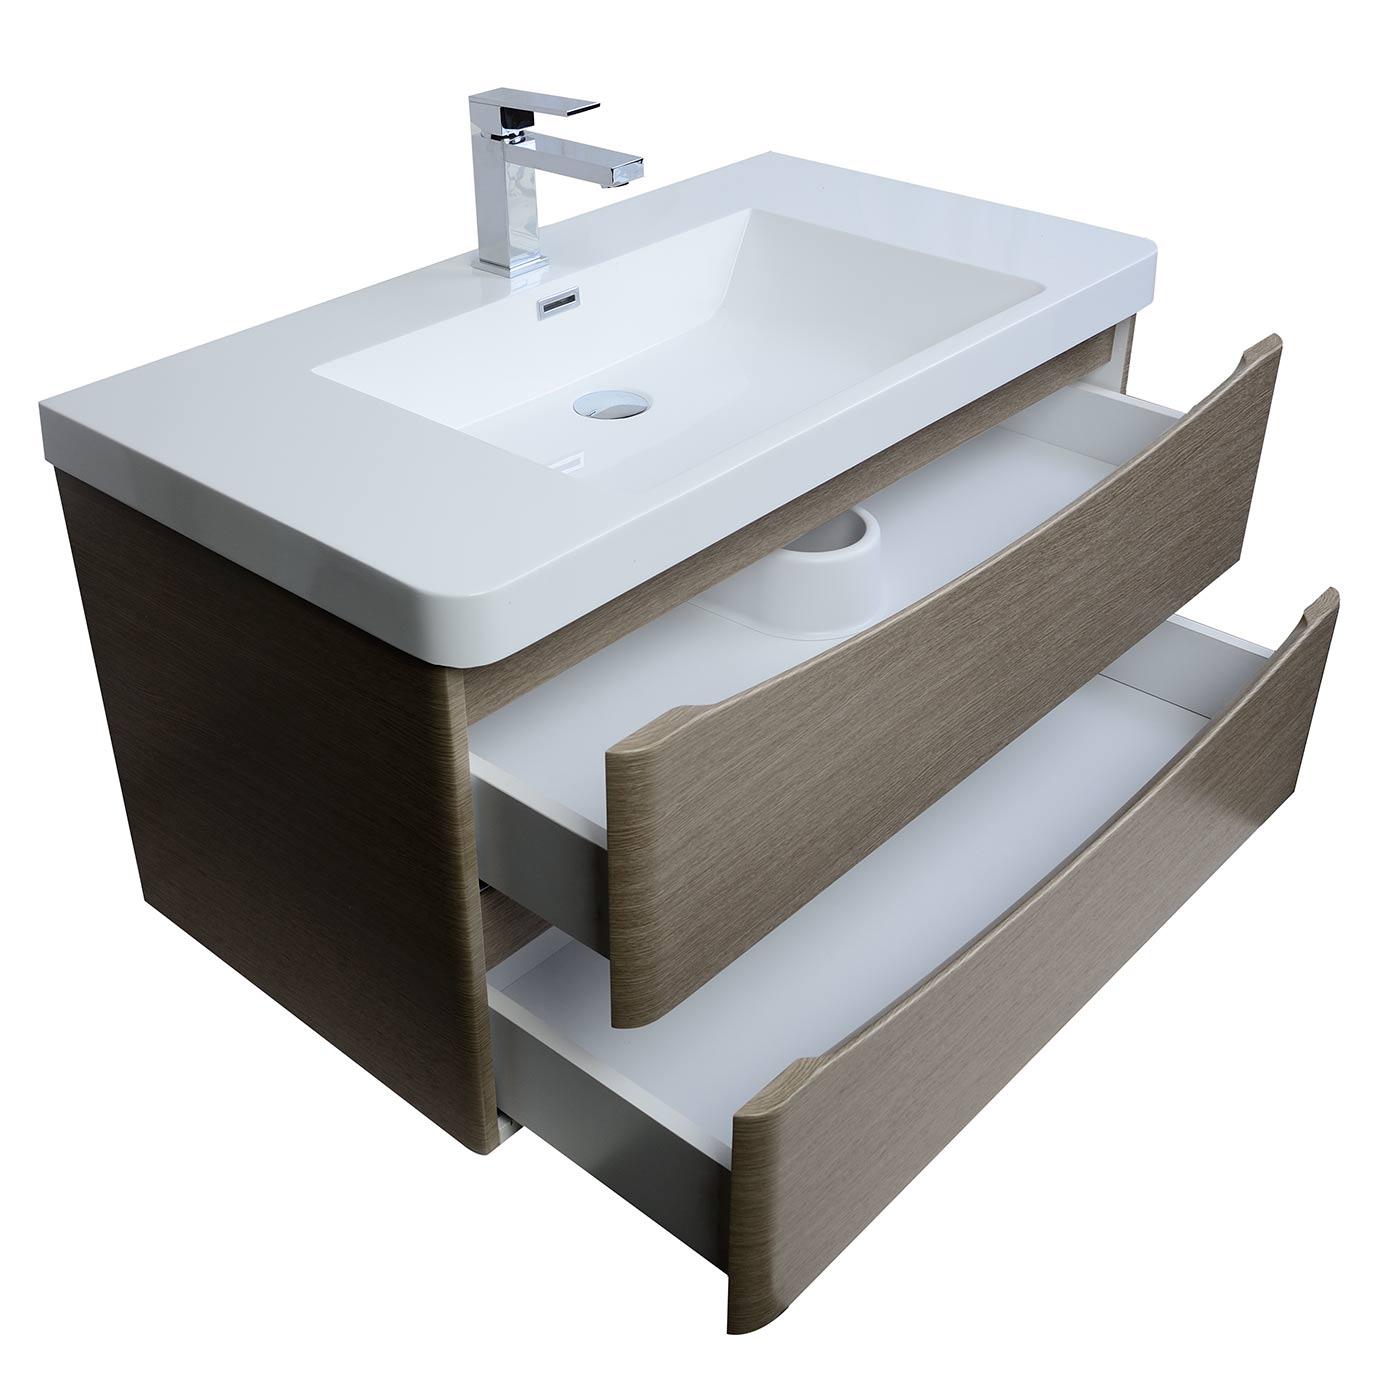 Buy Merida 30 Inch WallMount Bathroom Vanity in Light